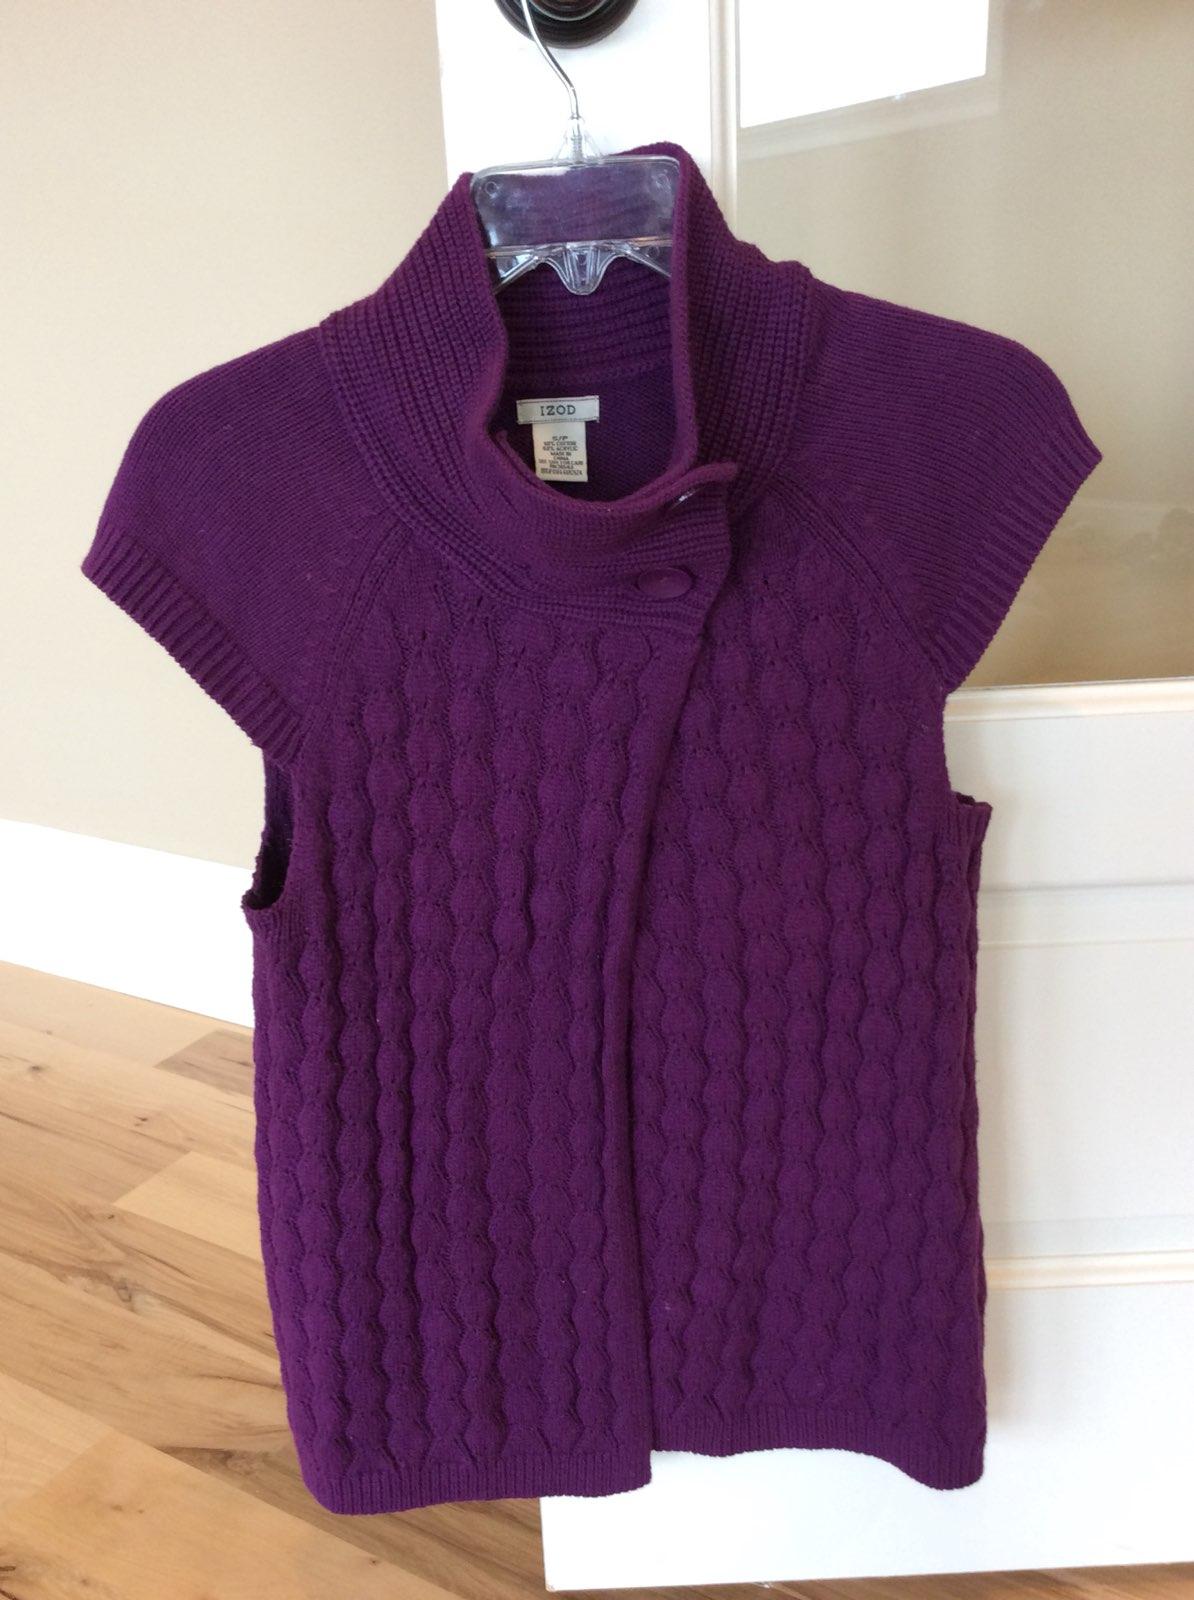 Purple Sweater Vest Small Izod Womens - Mercari: BUY & SELL THINGS ...